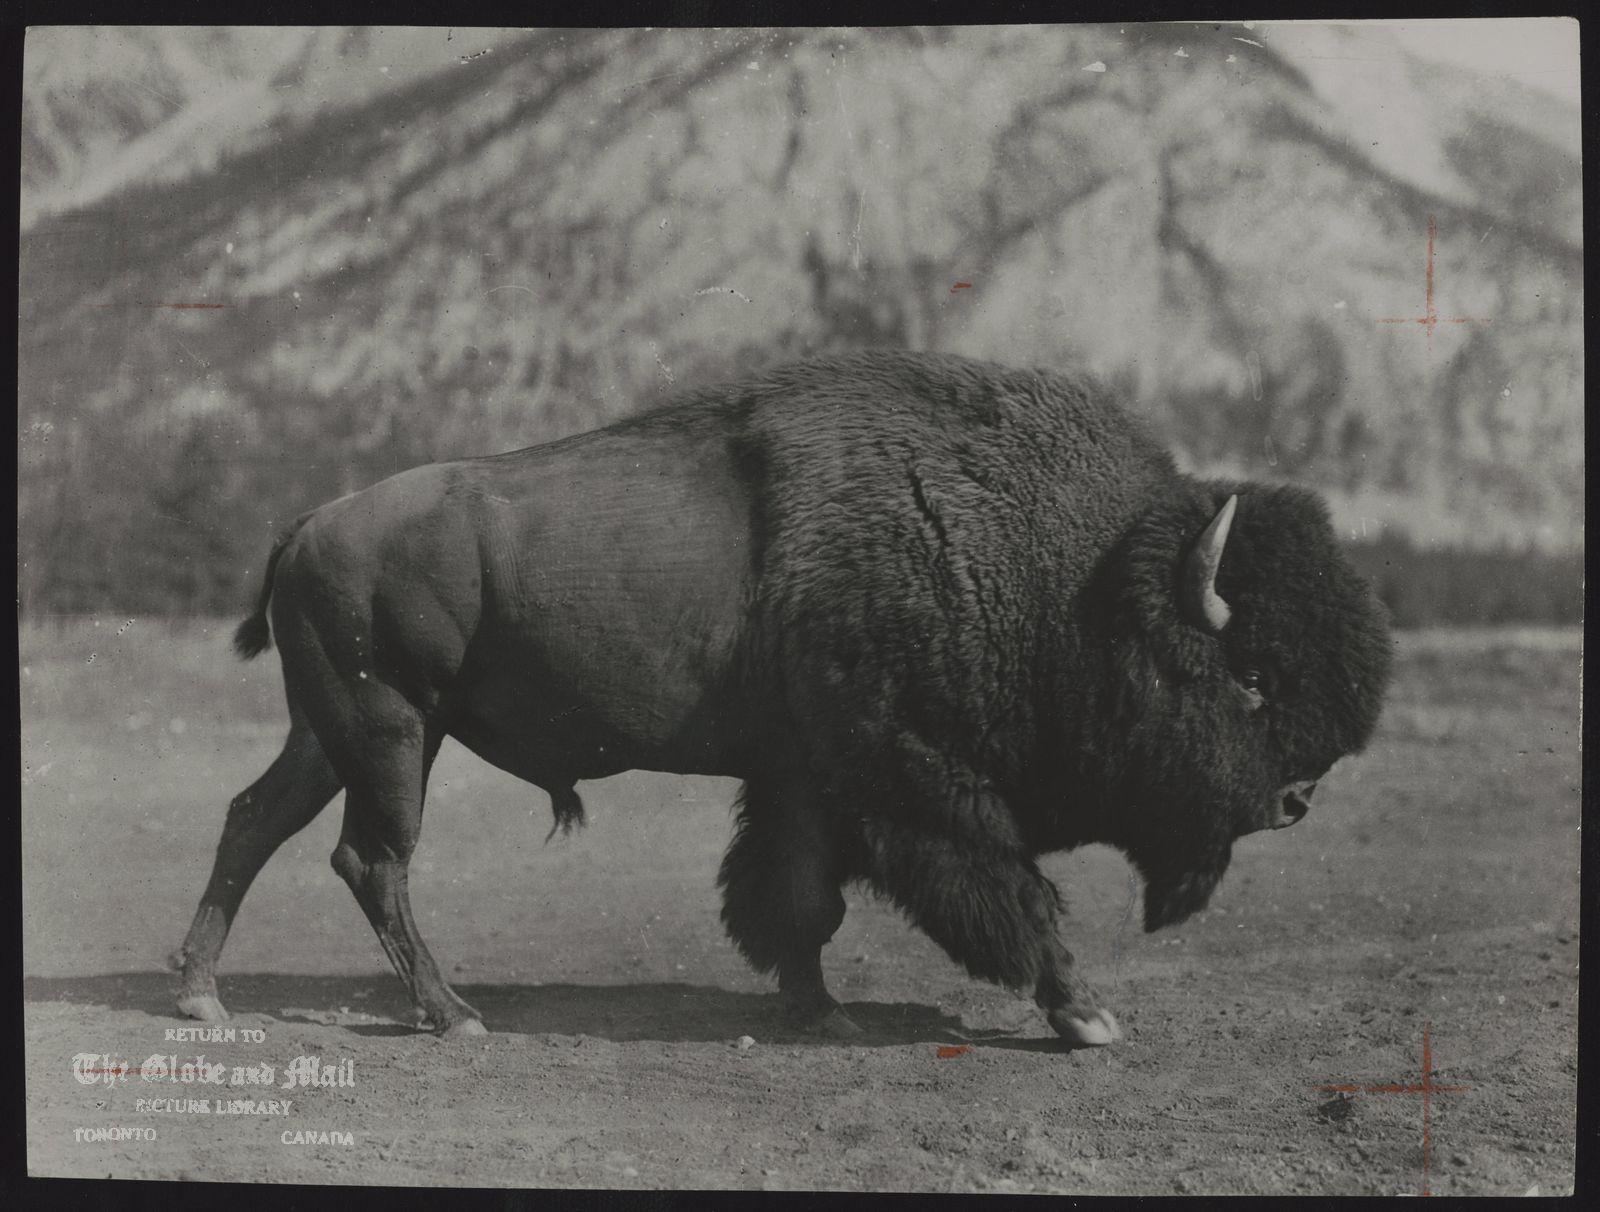 BUFFALO No 2515. Buffalo at Banff, Alberta. Canada's largest national park now holds world's largest buffalo herd.